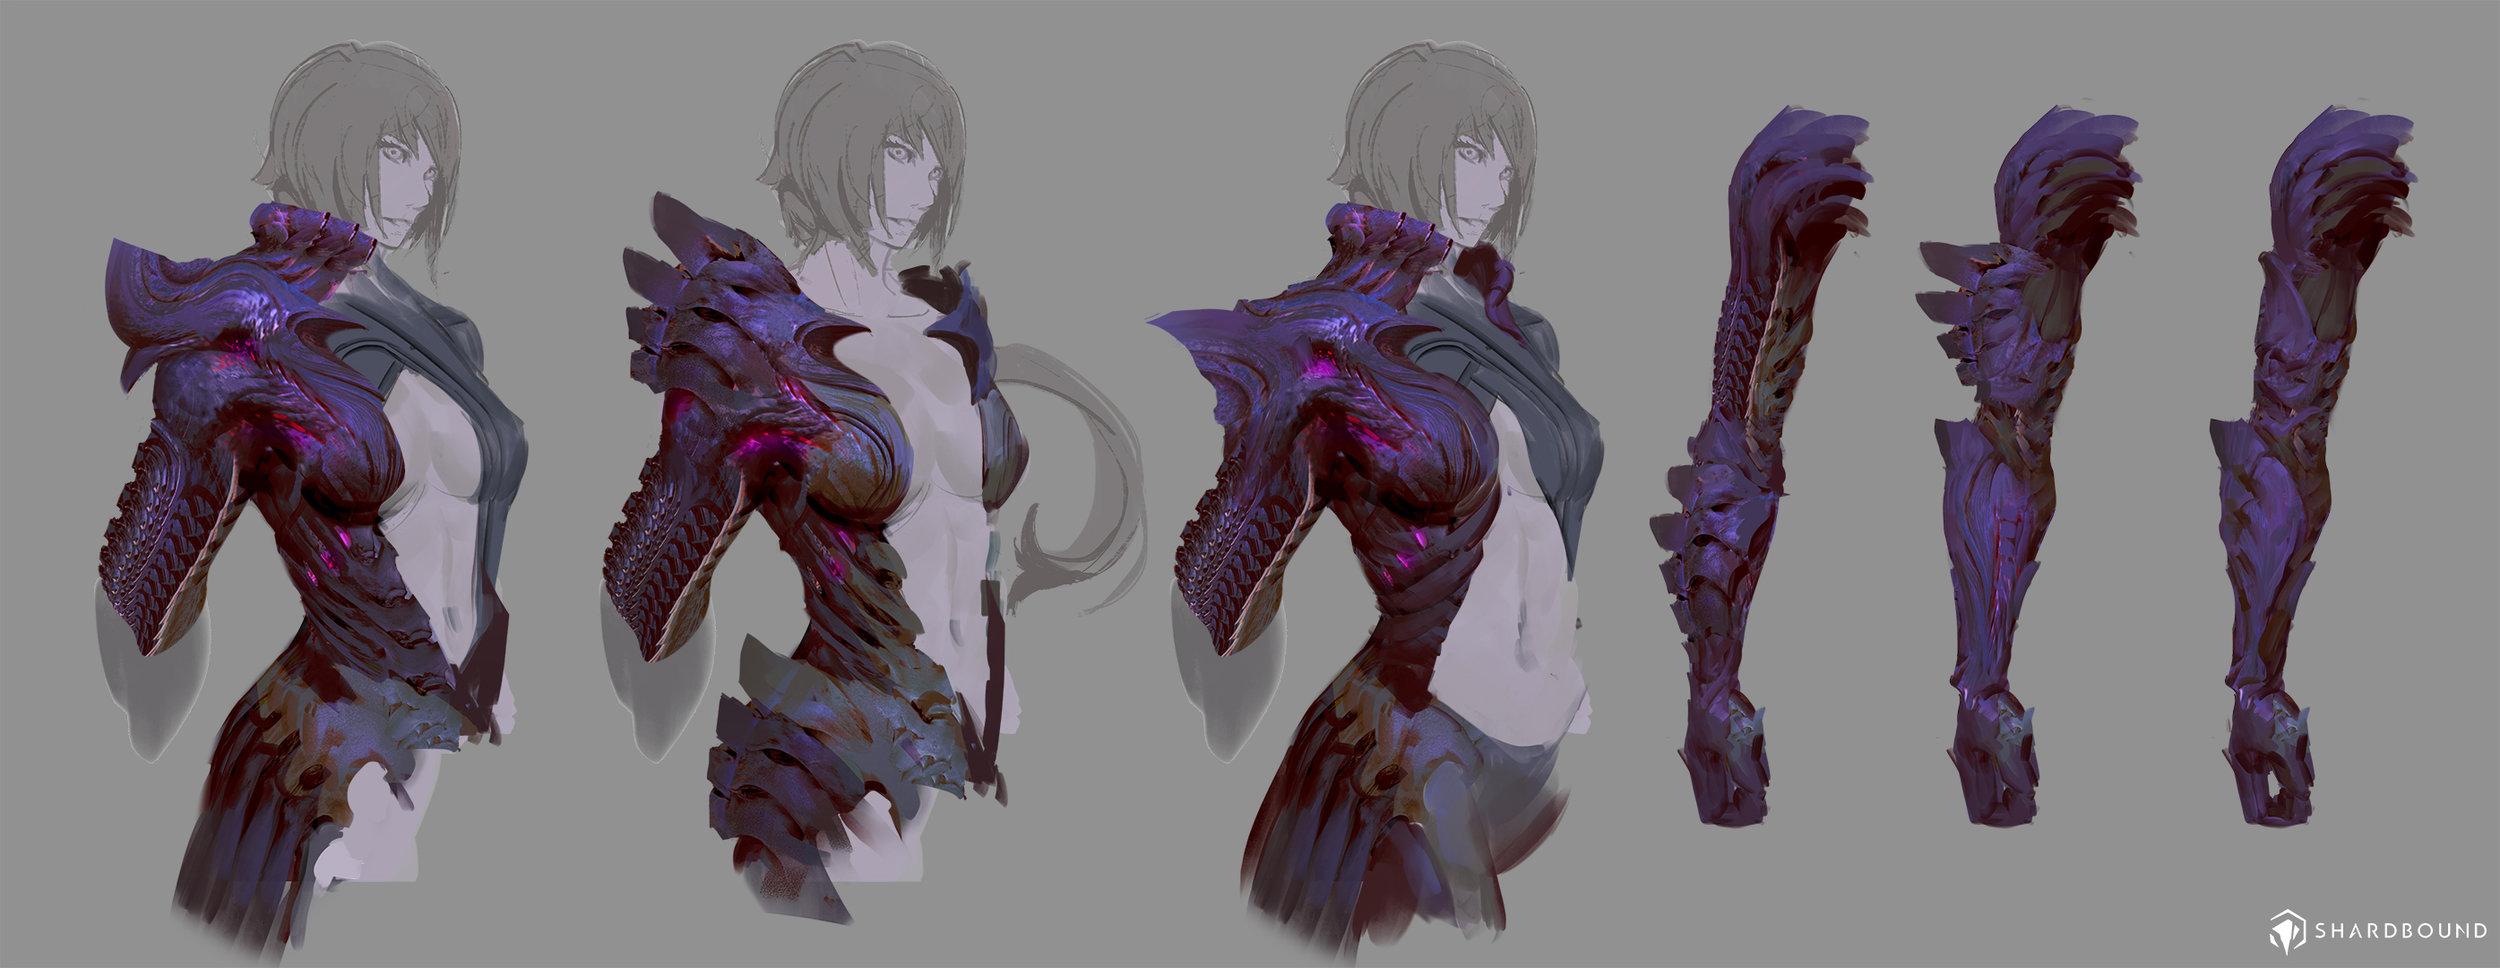 PurpleFaction_VizDev_StructureStudy1.jpg